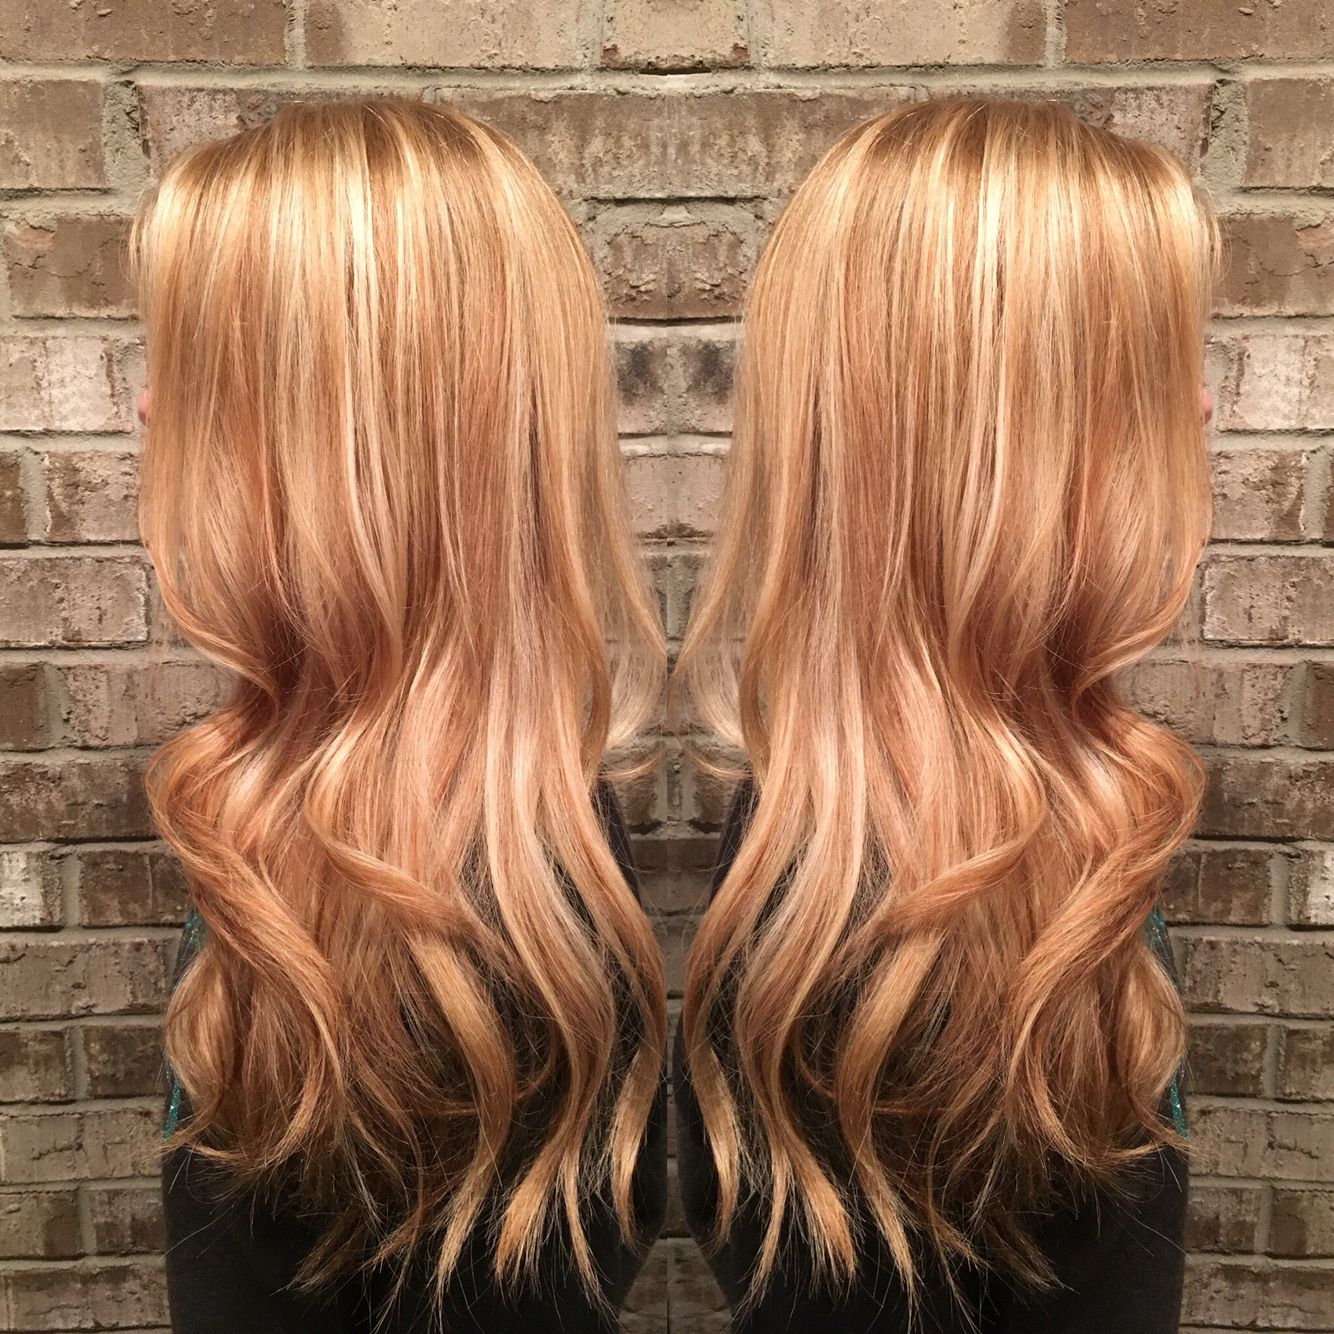 Strawberry Golden Blonde By Misty Callaway At Cheveux Salon In Hendersonville Tn Re Blonde Hair With Highlights Strawberry Blonde Hair Color Strawberry Hair